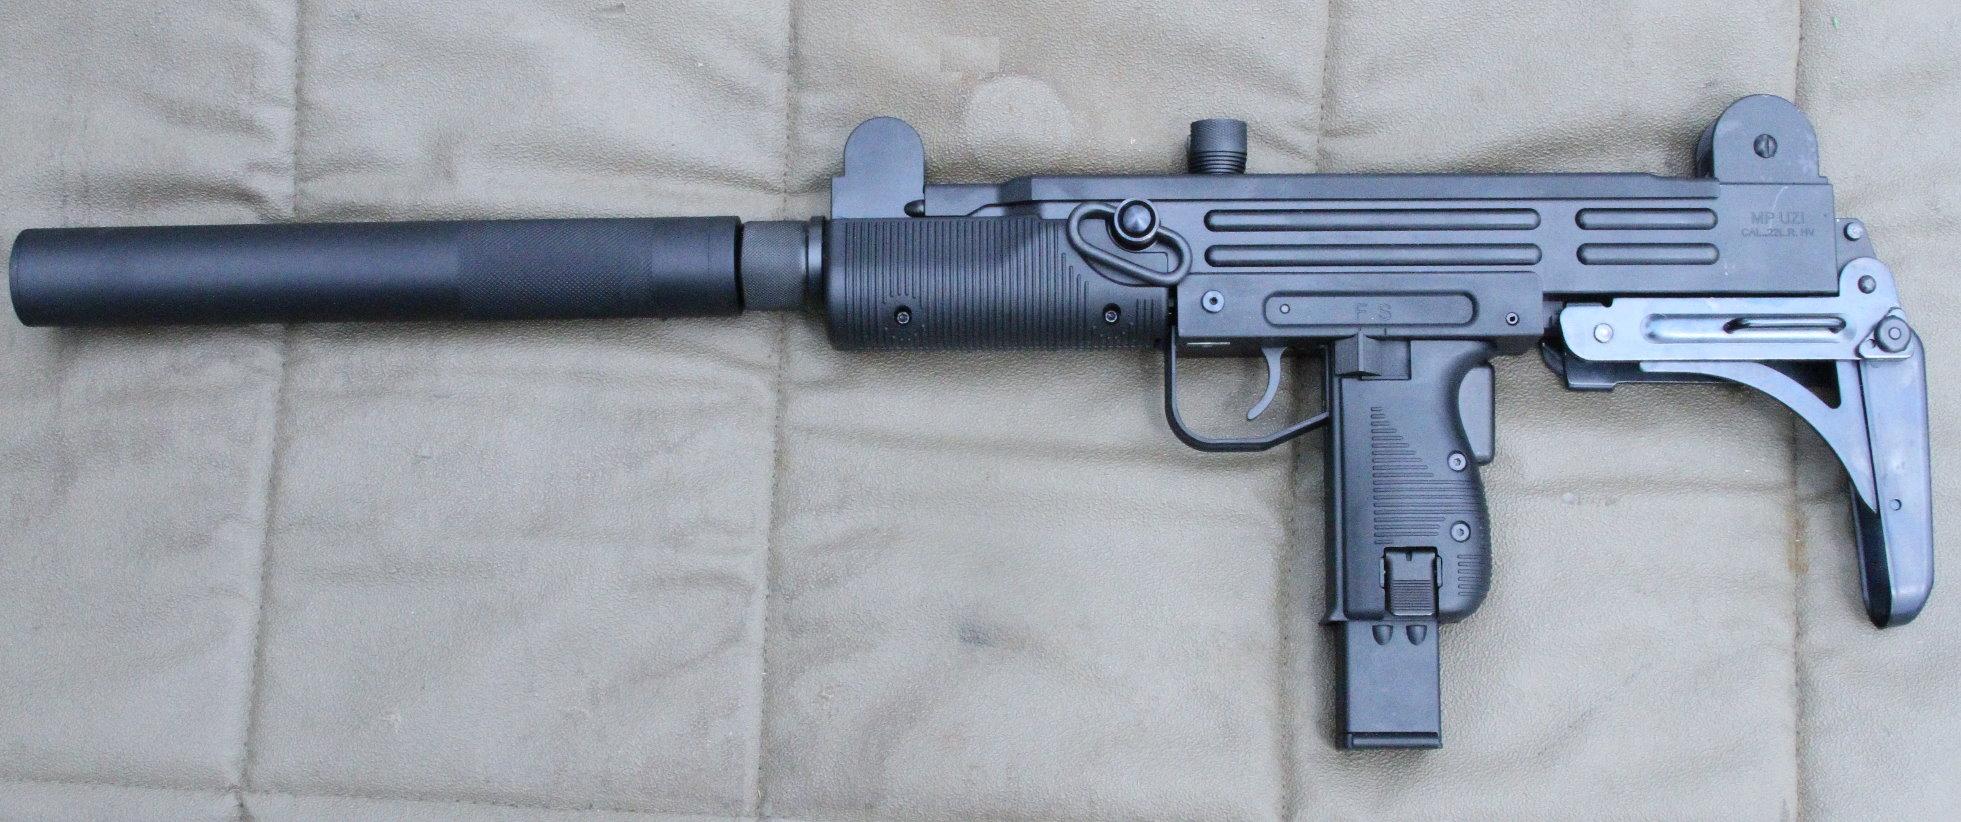 Walther  22LR Uzi Copy - New Gun Review - GunsAmerica Digest